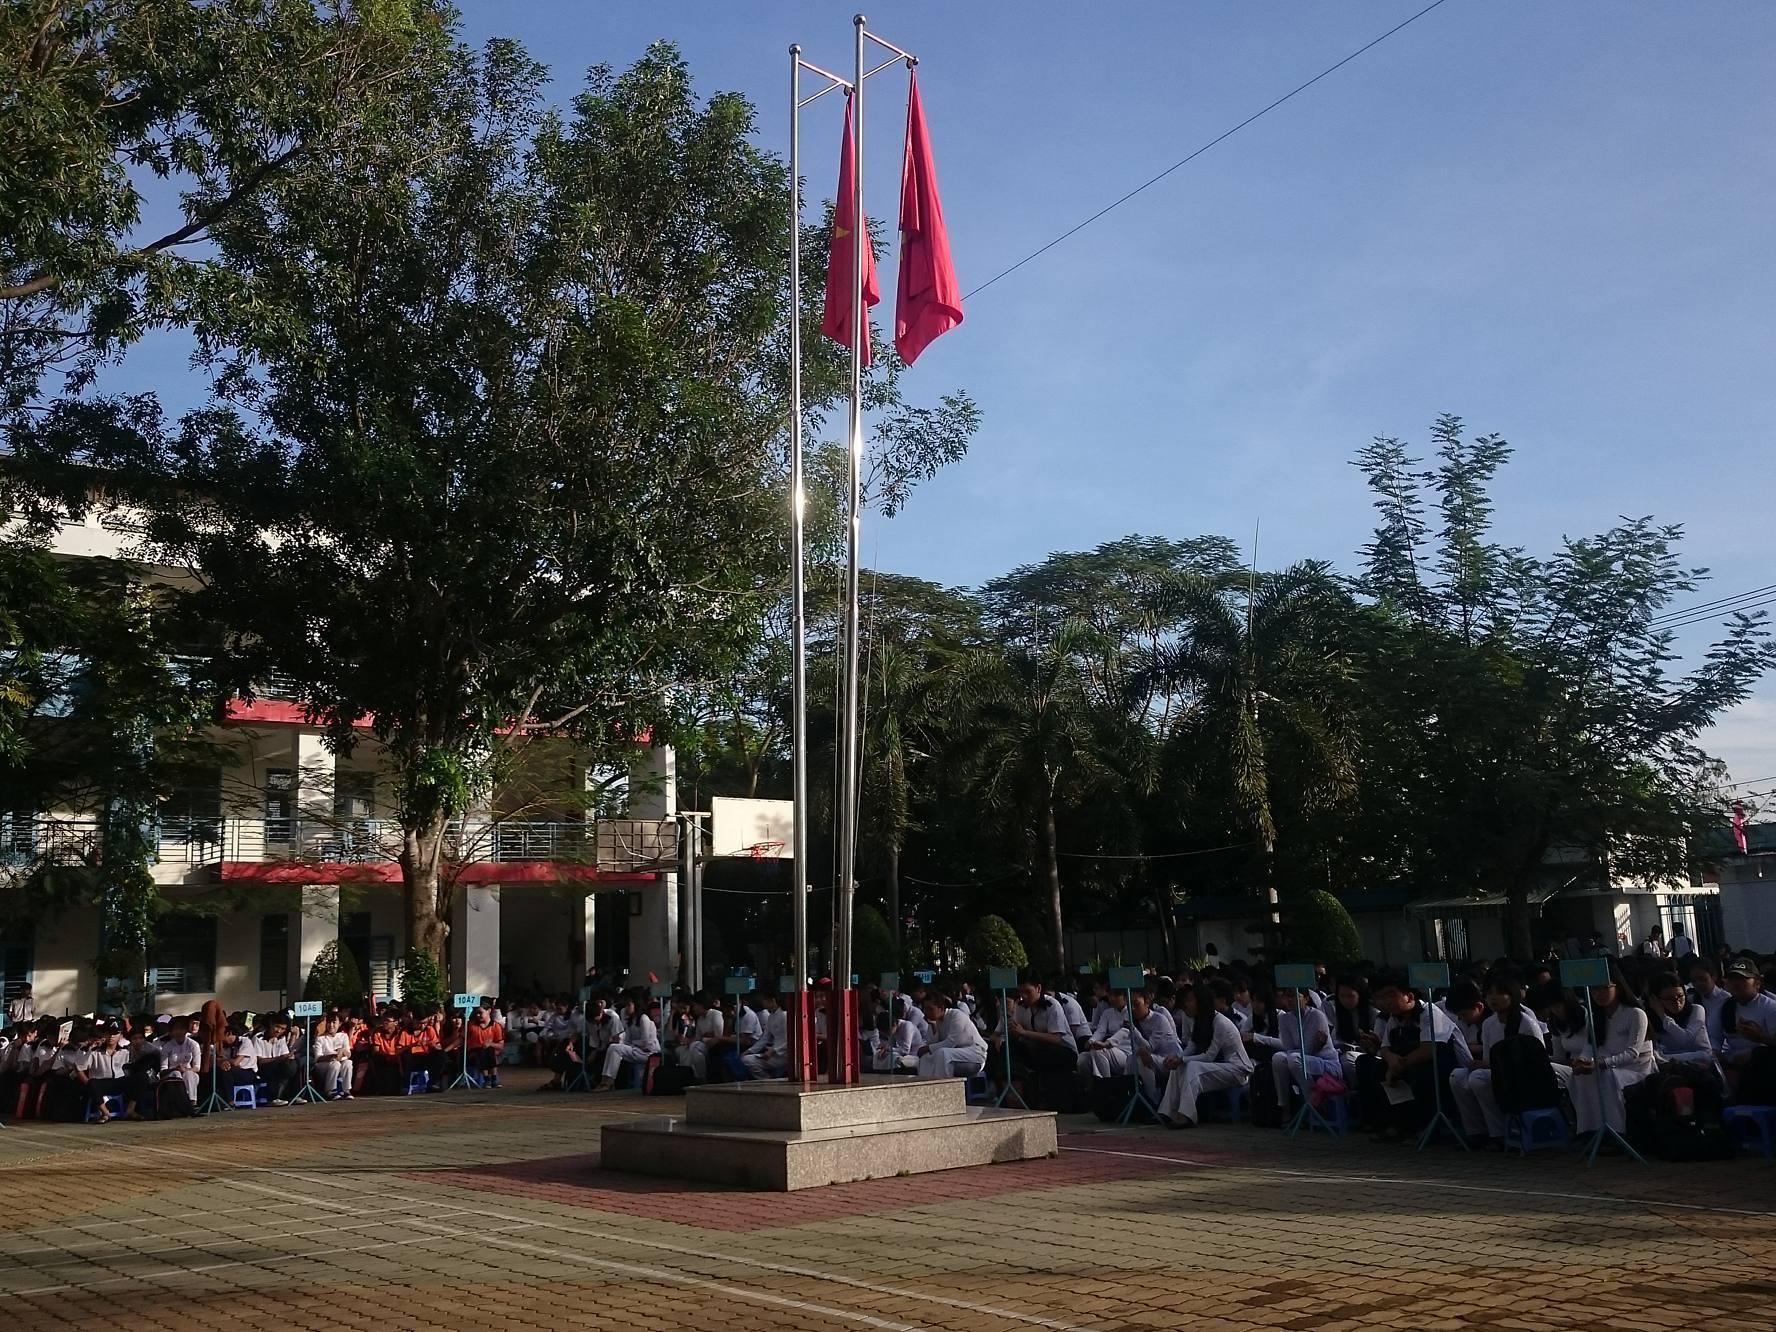 Phong chong S 8